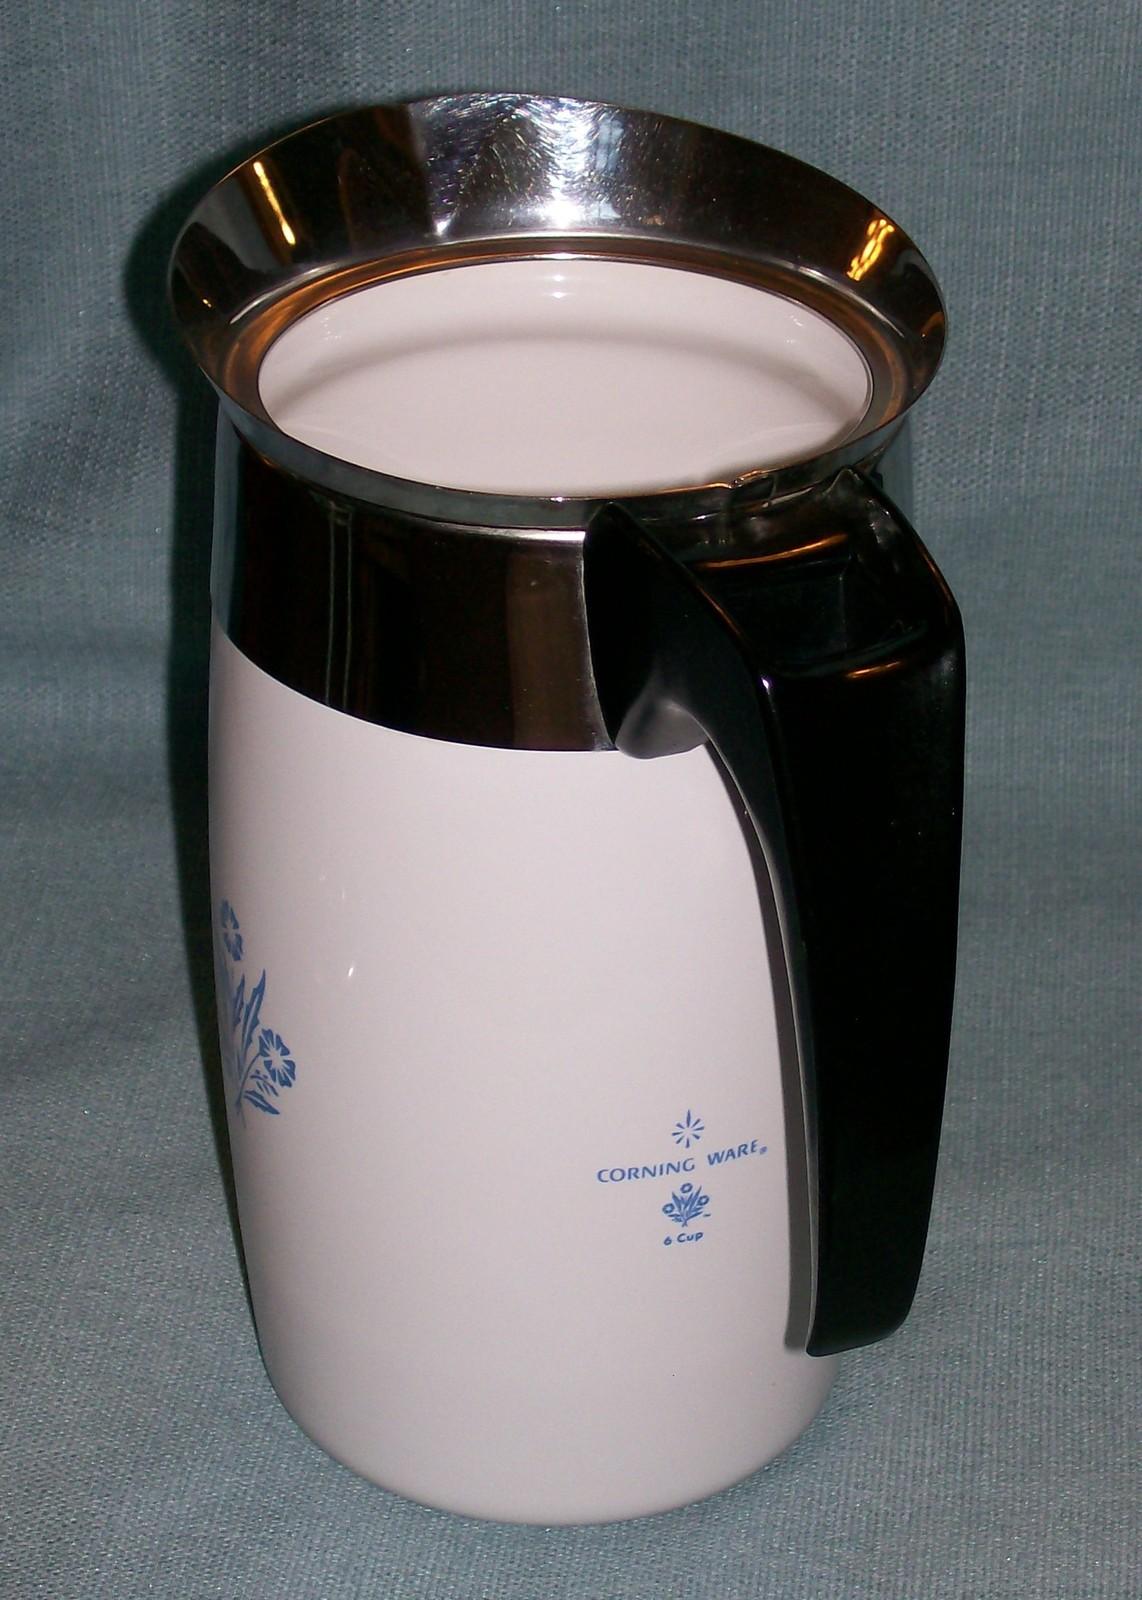 Corning Ware BLUE CORNFLOWER Electric Coffee Pot/Percolator 6 cup P-6-EP VGVC  image 4